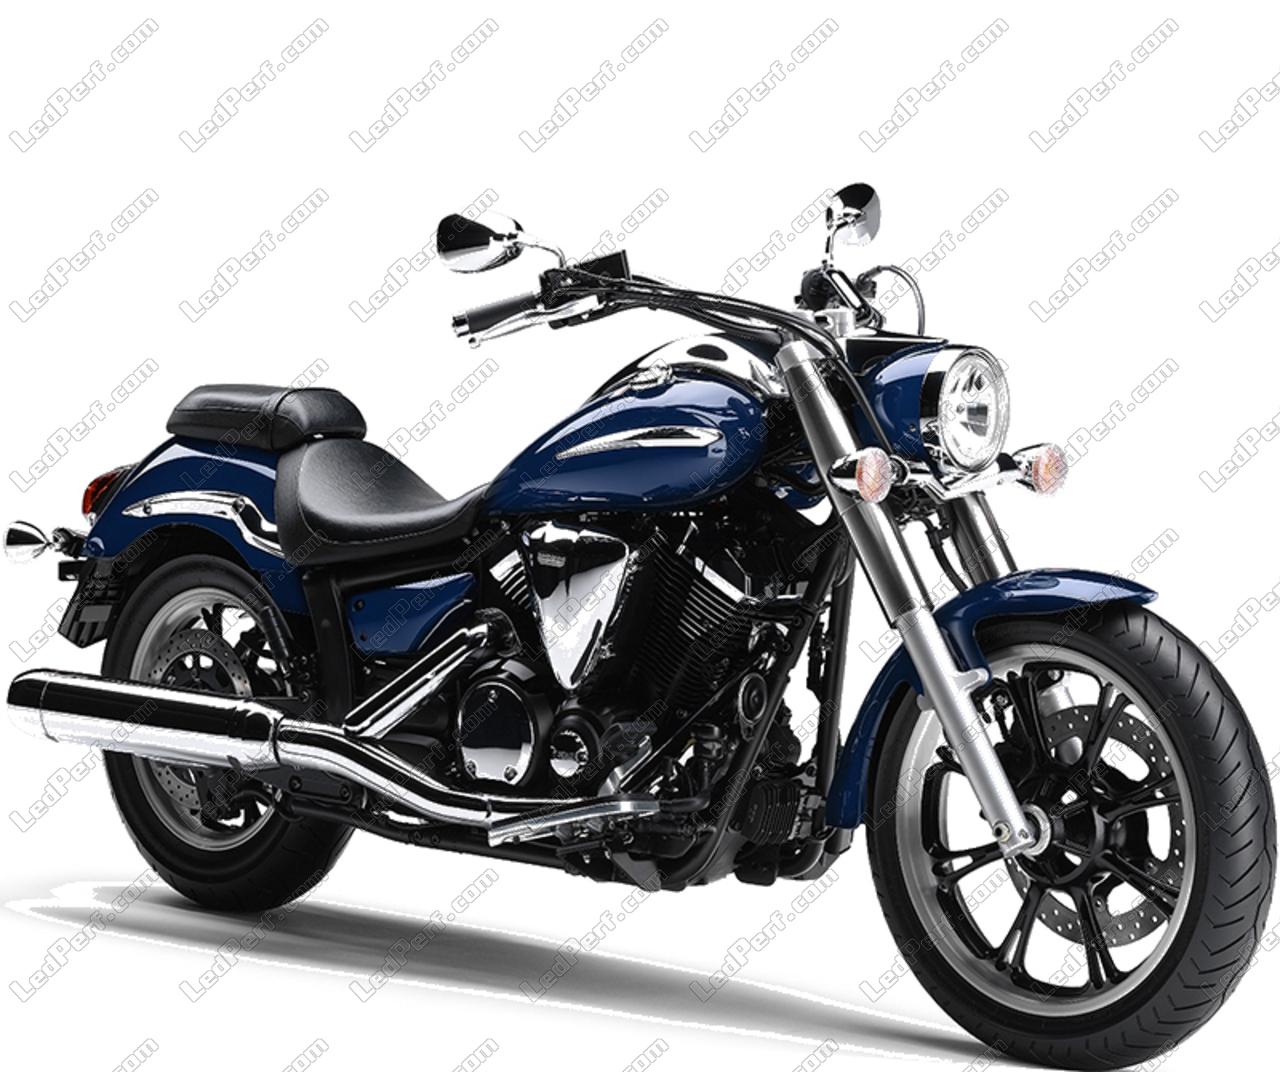 phares additionnels led pour moto yamaha xvs 950 midnight star. Black Bedroom Furniture Sets. Home Design Ideas